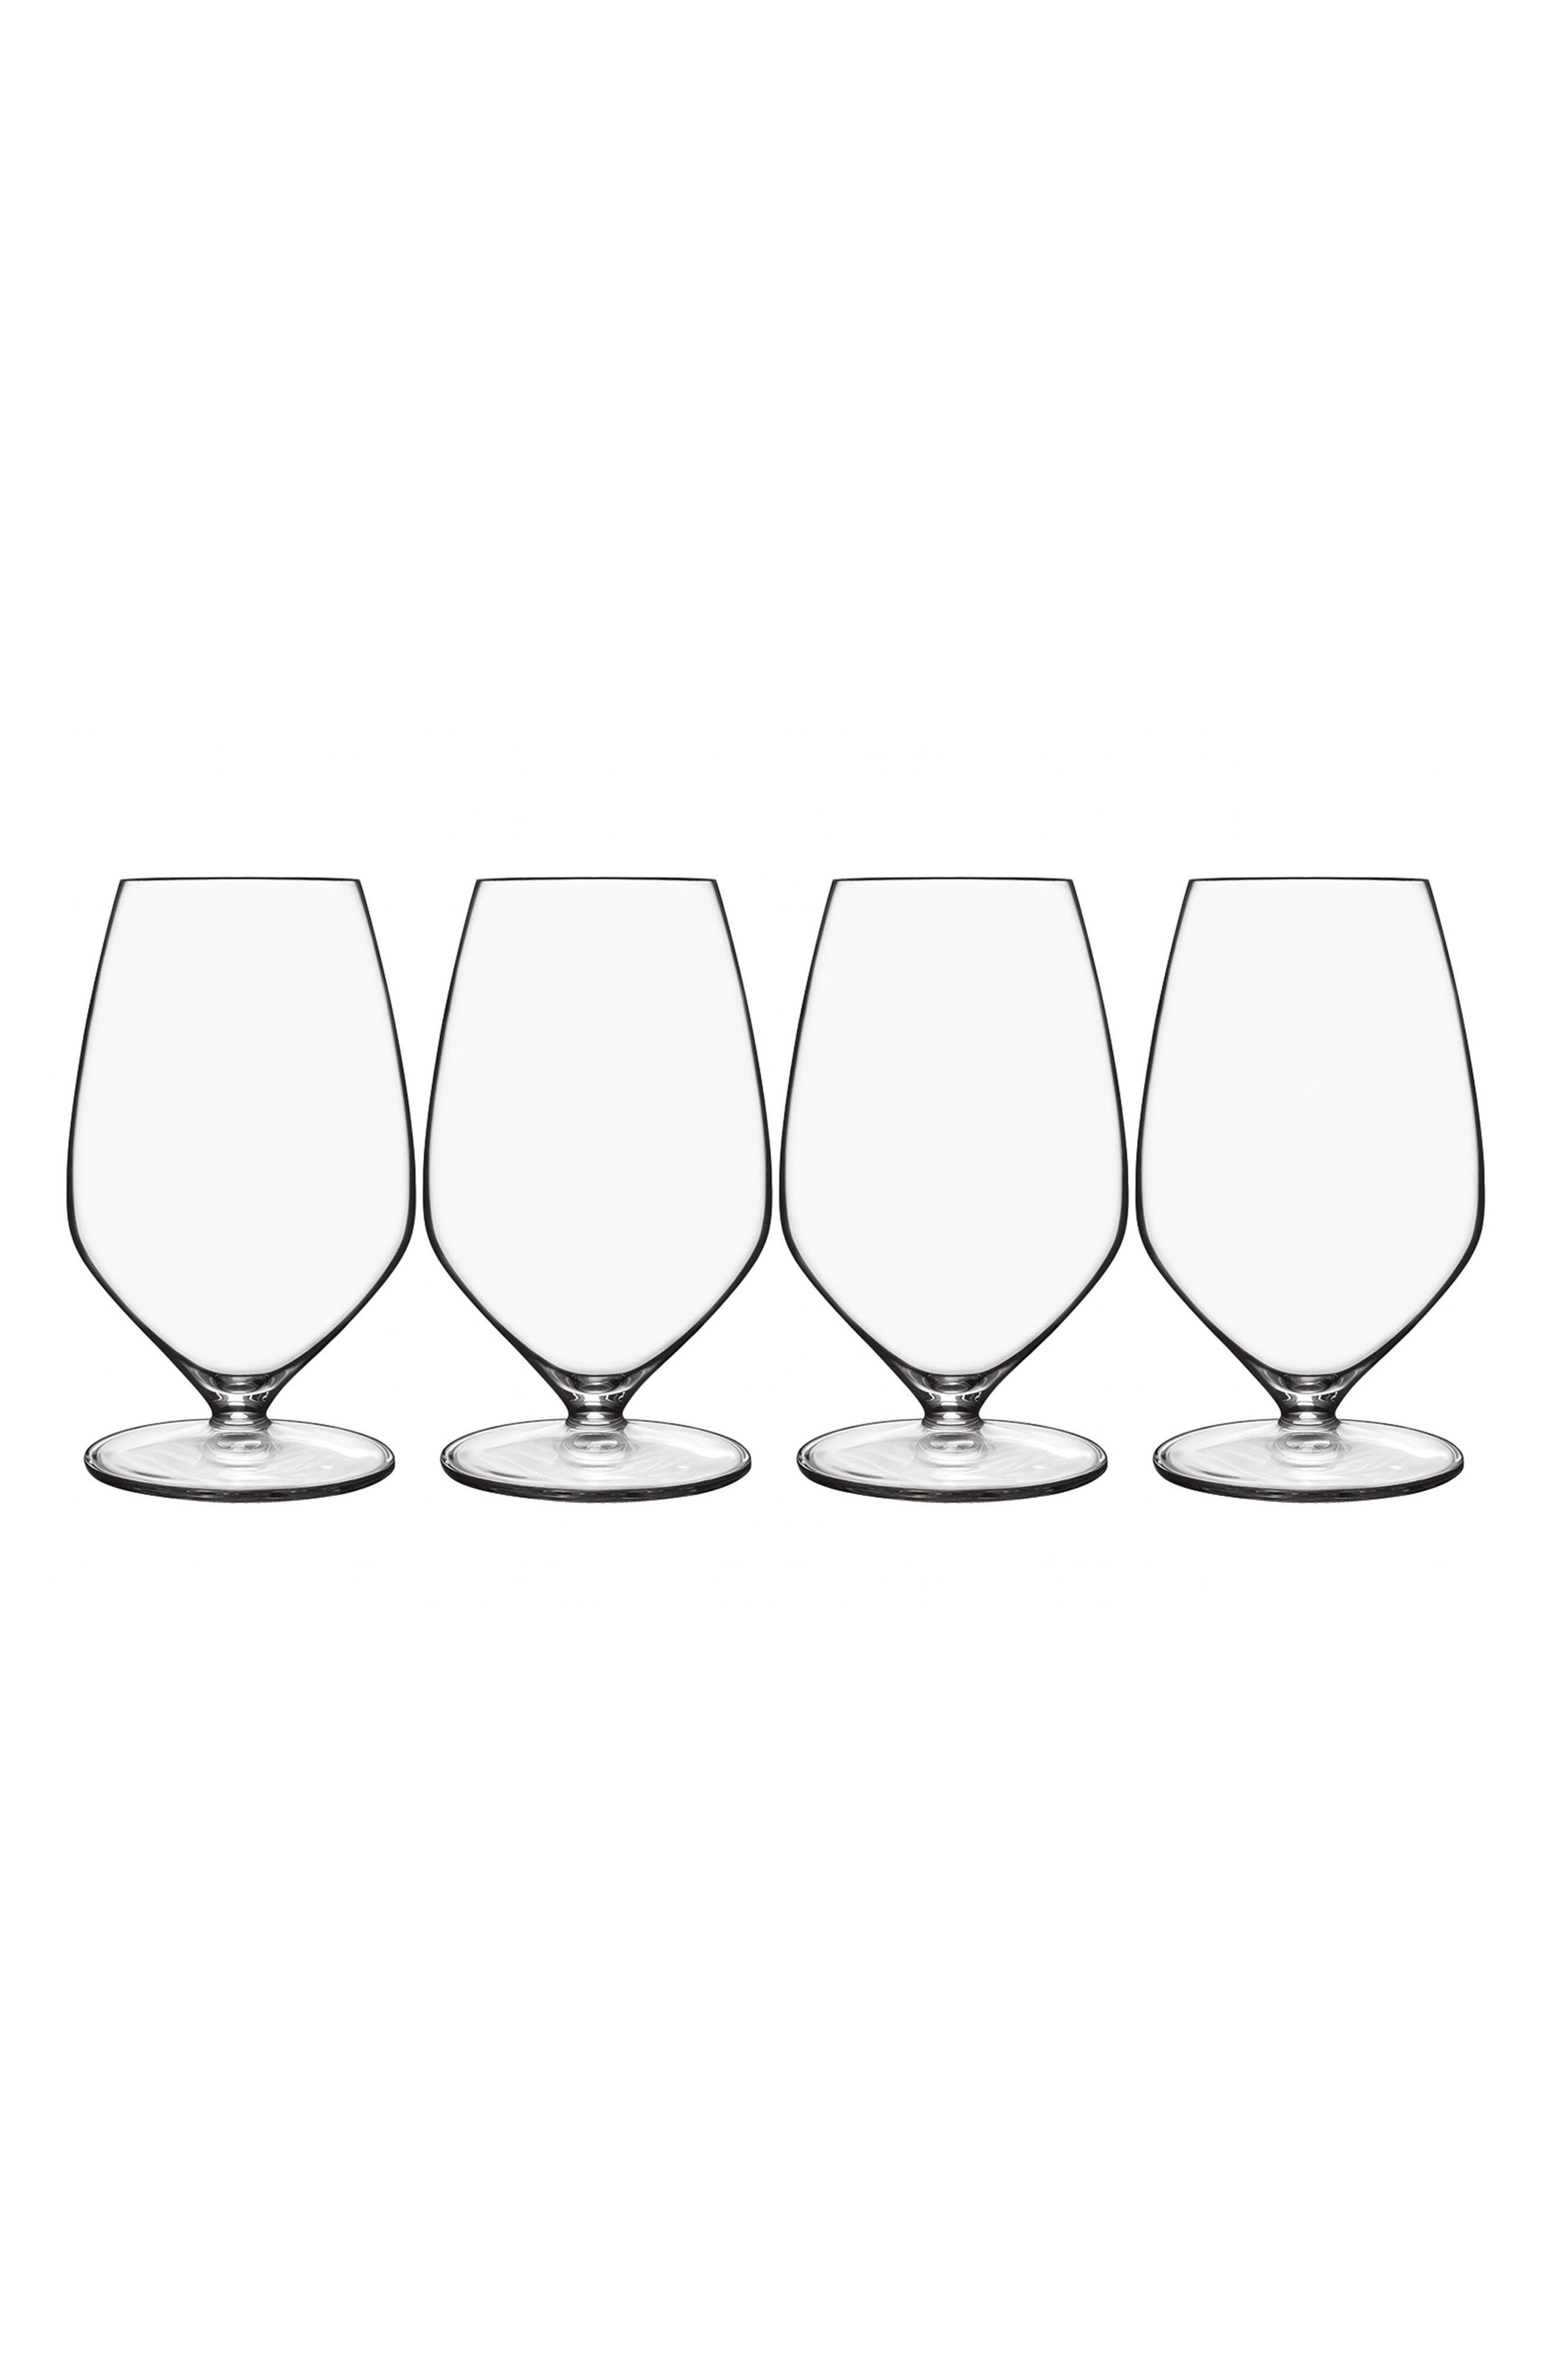 T-Glass Set of 4 Sauvignon Glasses,                             Main thumbnail 1, color,                             CLEAR